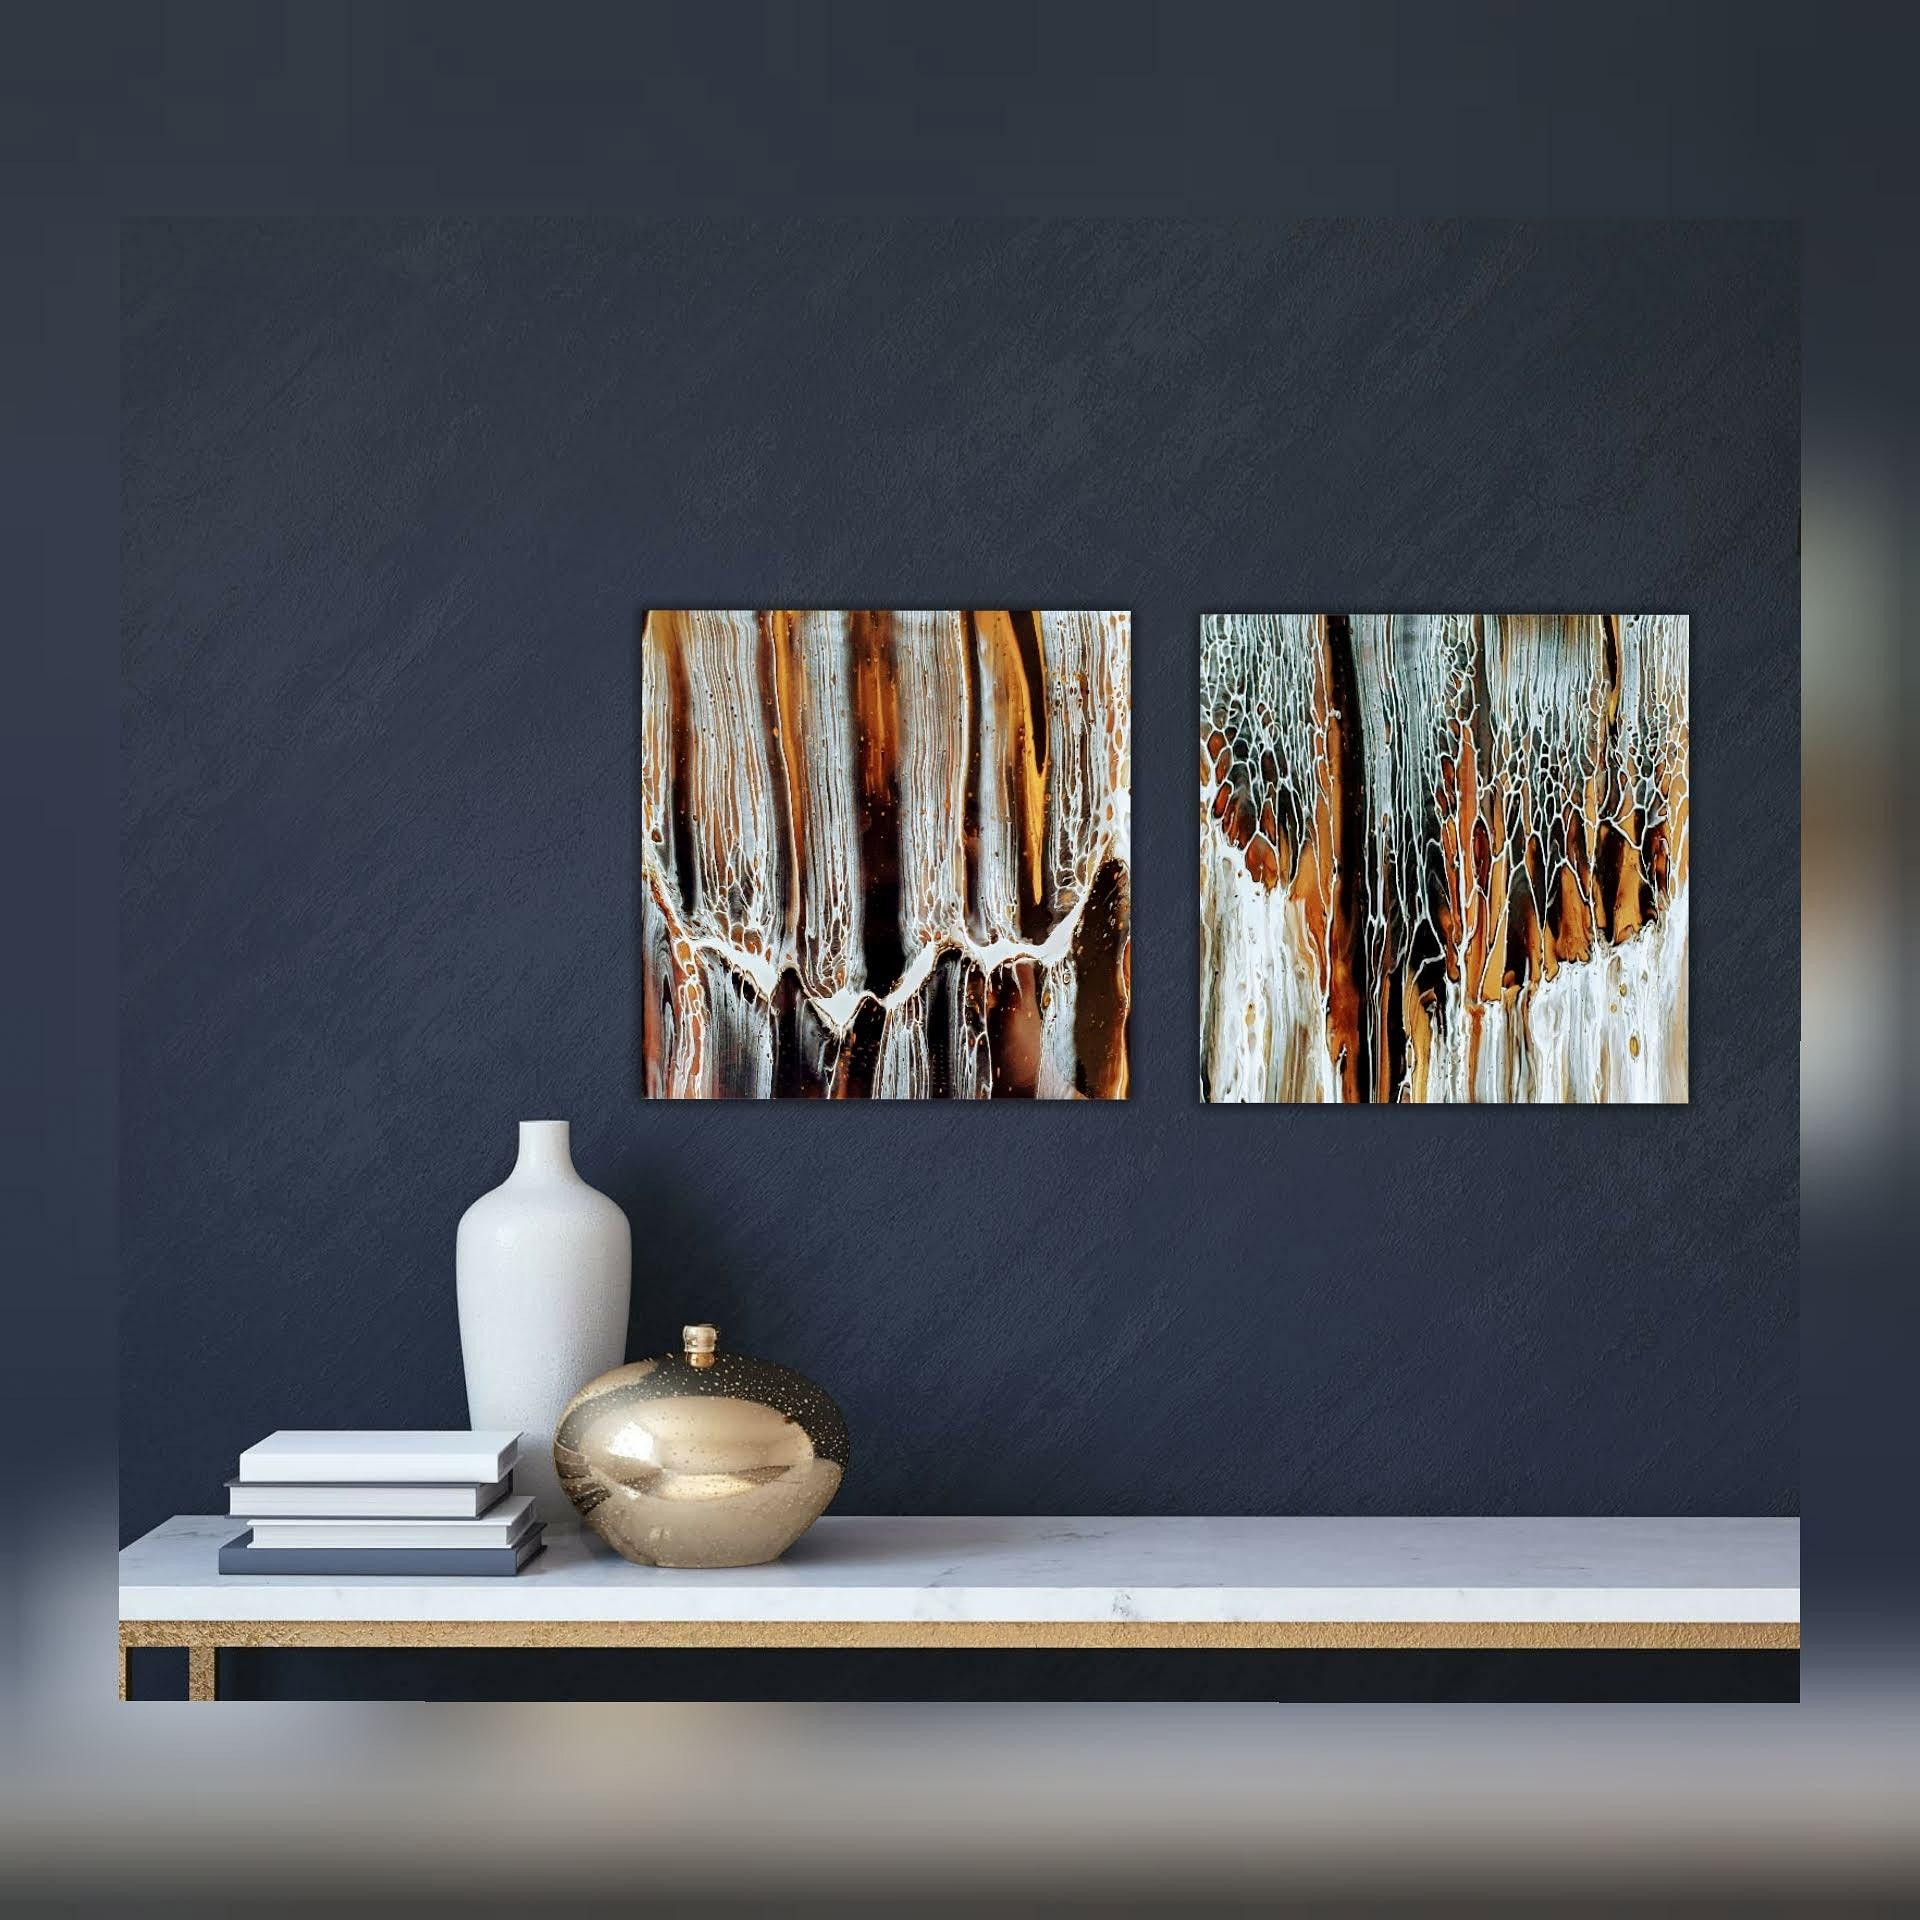 Holz Fluidart Acrylgiessen Swipe 2